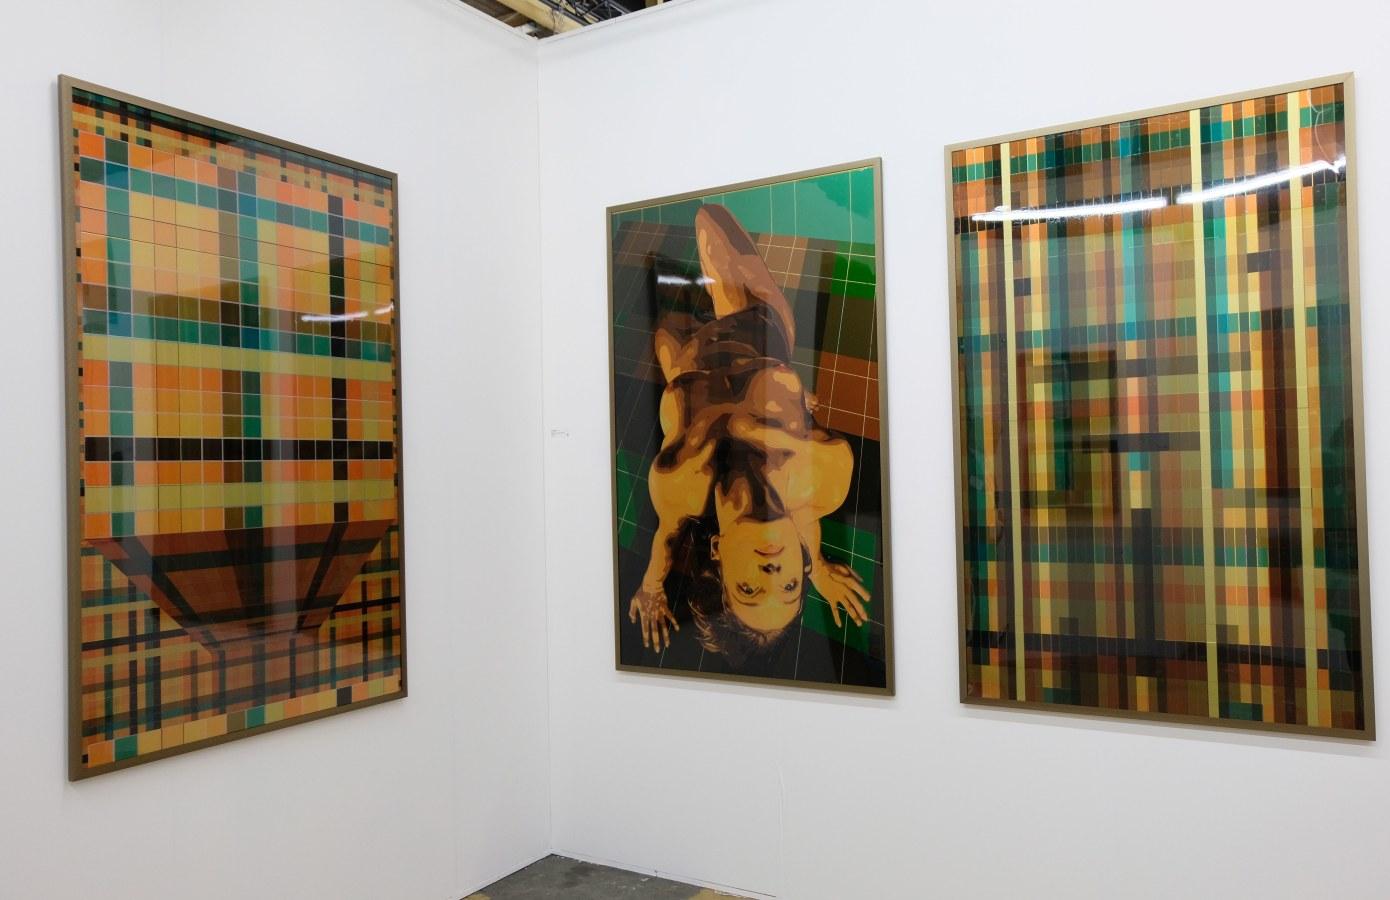 Art Rotterdam 2020, Daniel Mullen, Mike Ottink, Erik Sep, Tom Woestenborghs,